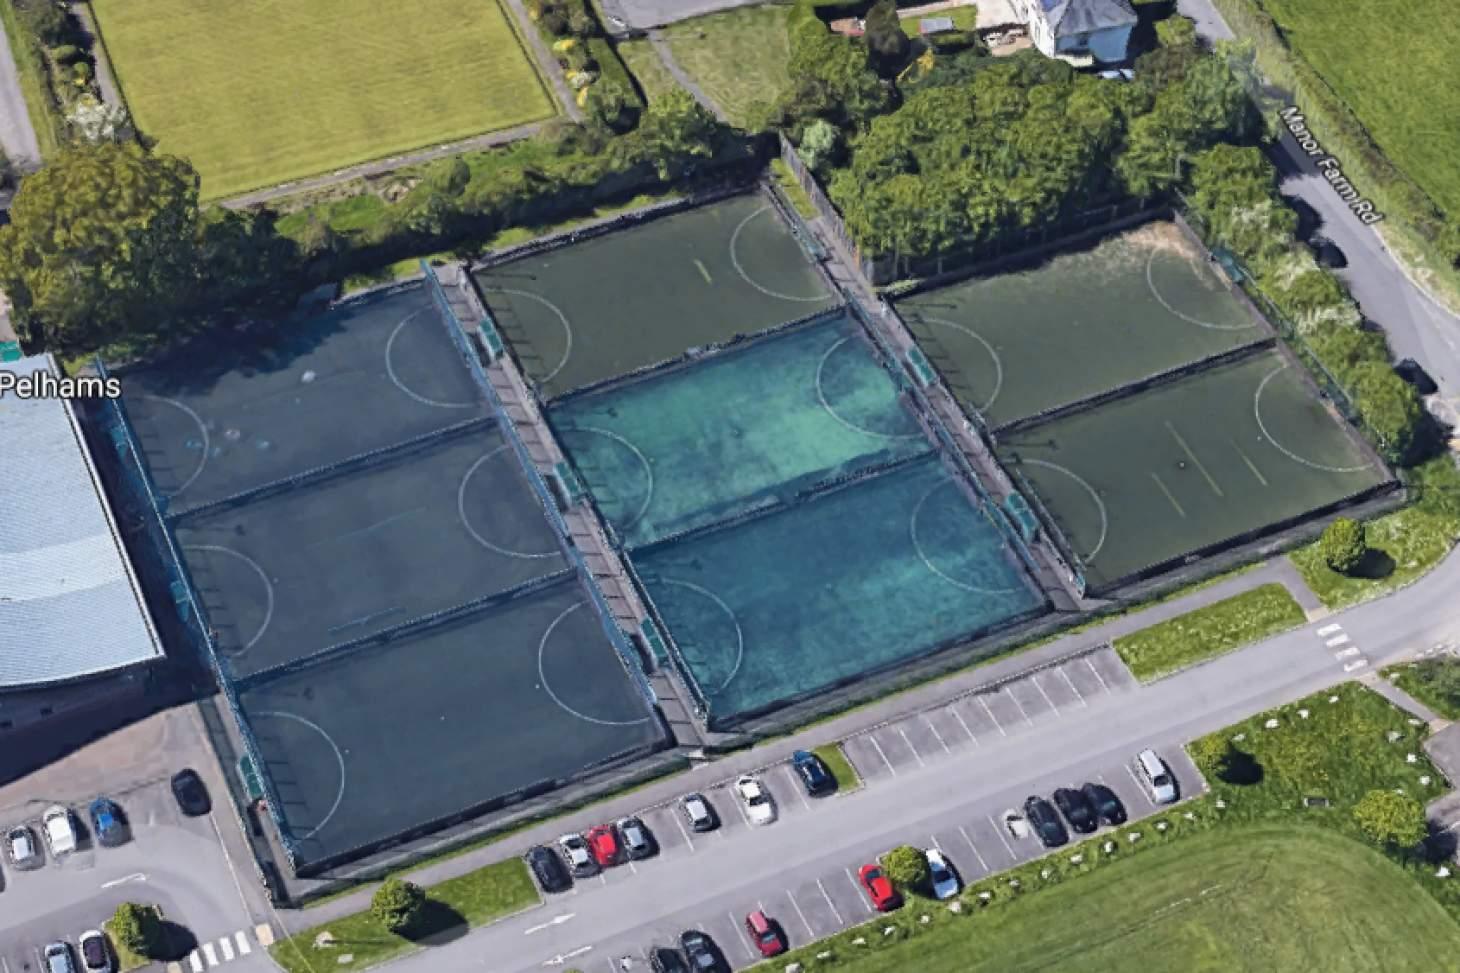 PlayFootball Bournemouth Pelhams 5 a side   3G Astroturf football pitch